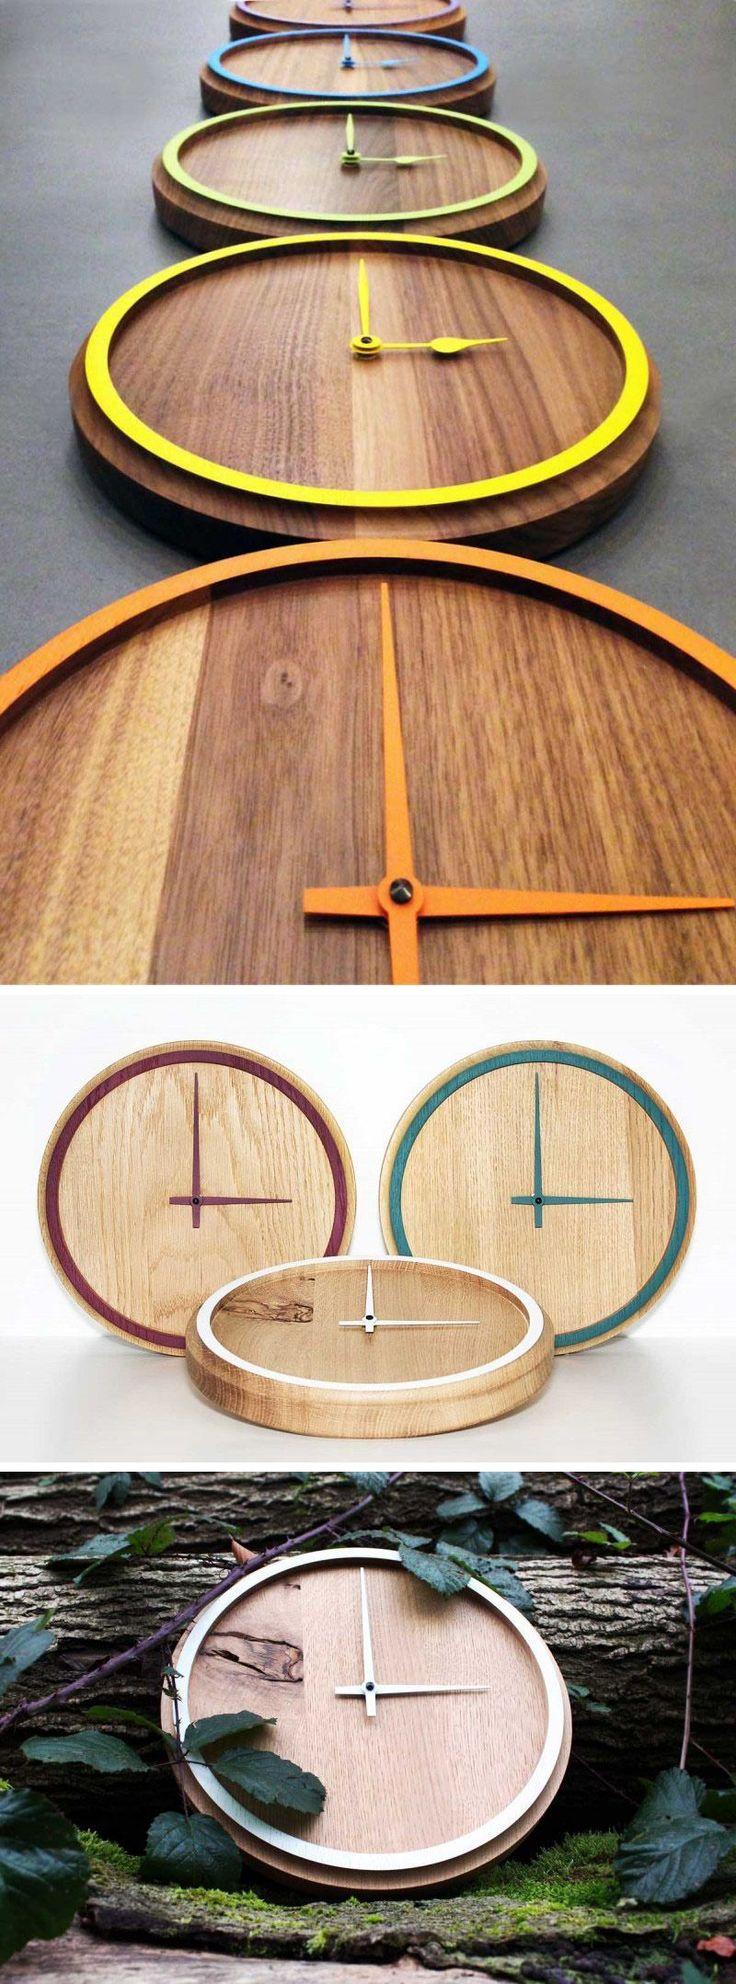 Best 25 Wall Of Clocks Ideas On Pinterest Wall Clock